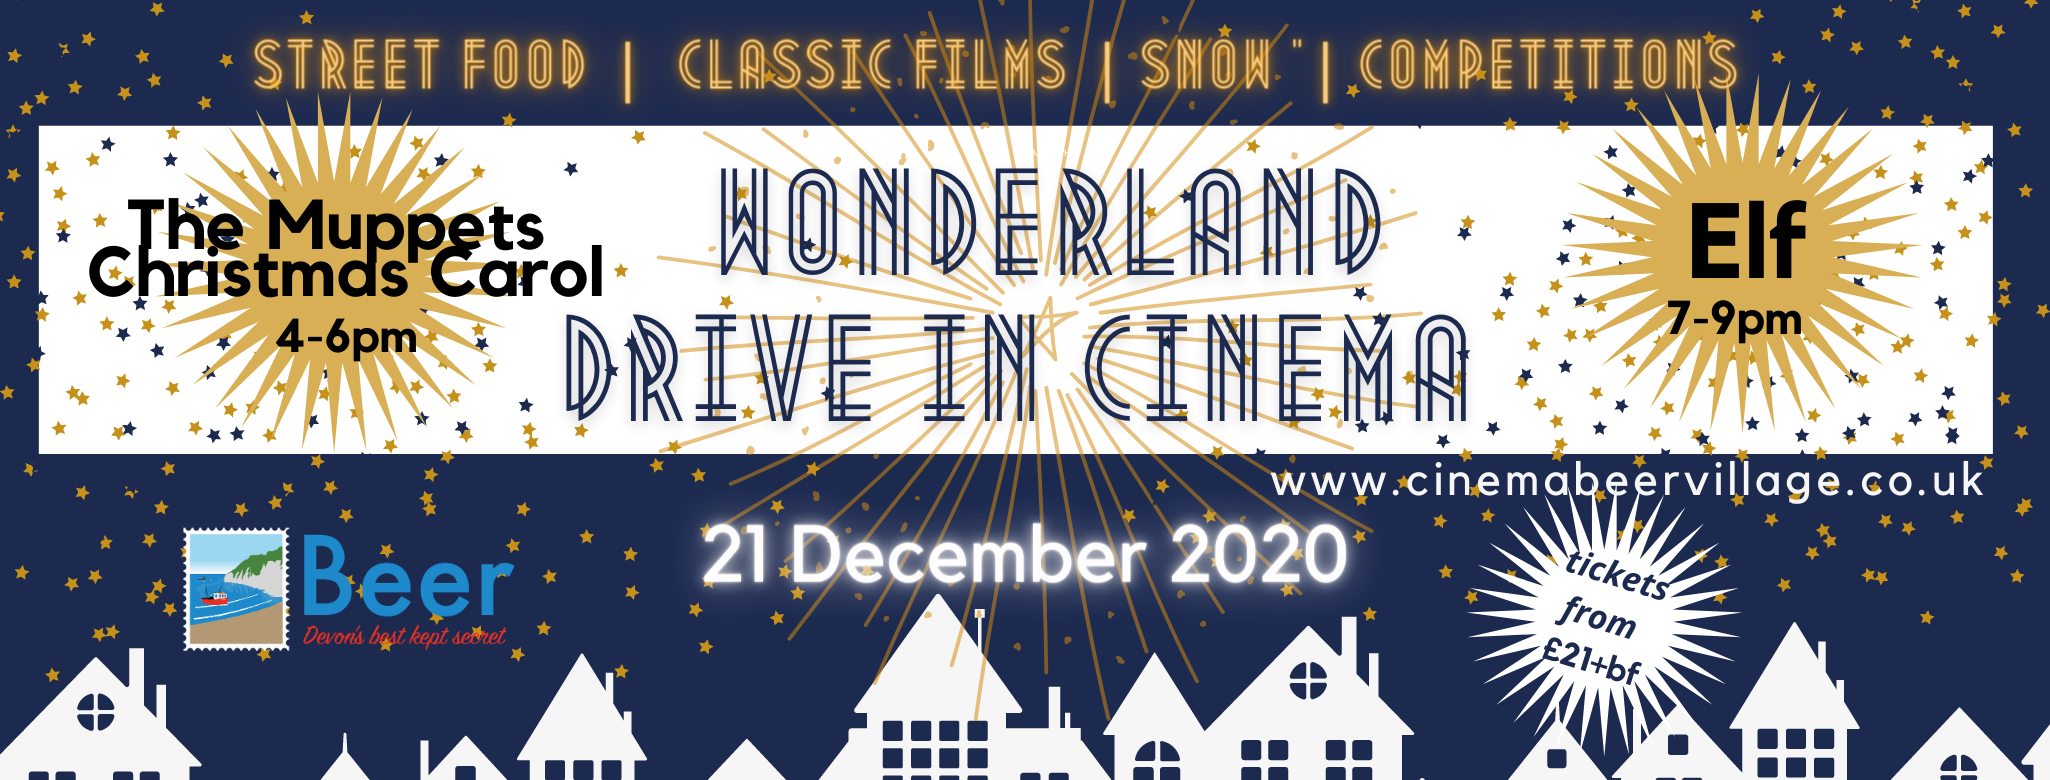 Drive In cinema East Devon